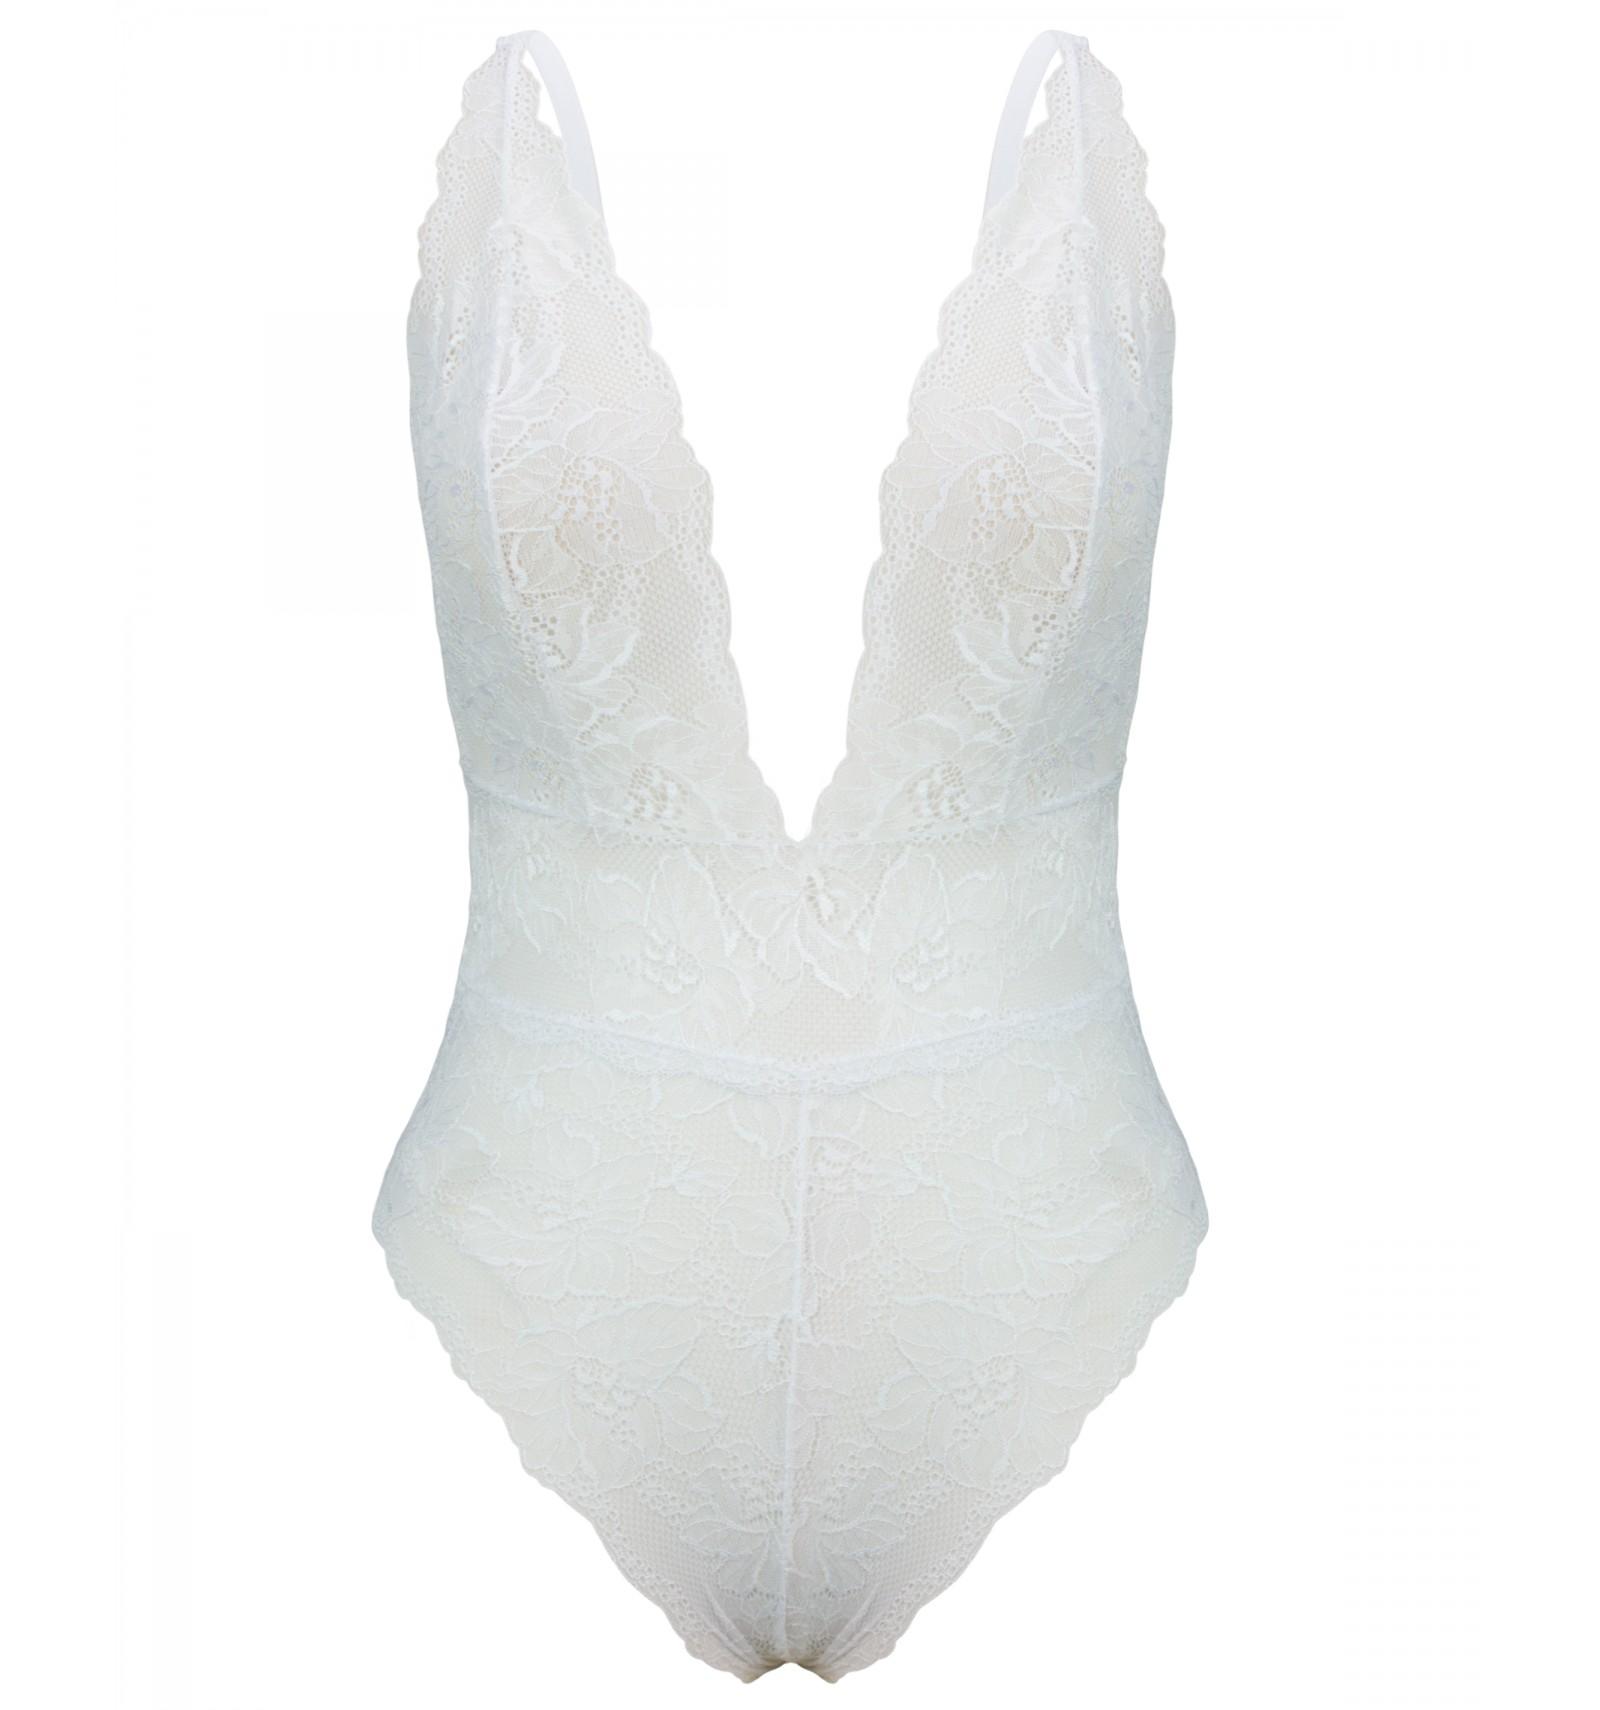 8f84ac990 Body Lorhen em Renda Sem Bojo Com Decote Profundo Branco